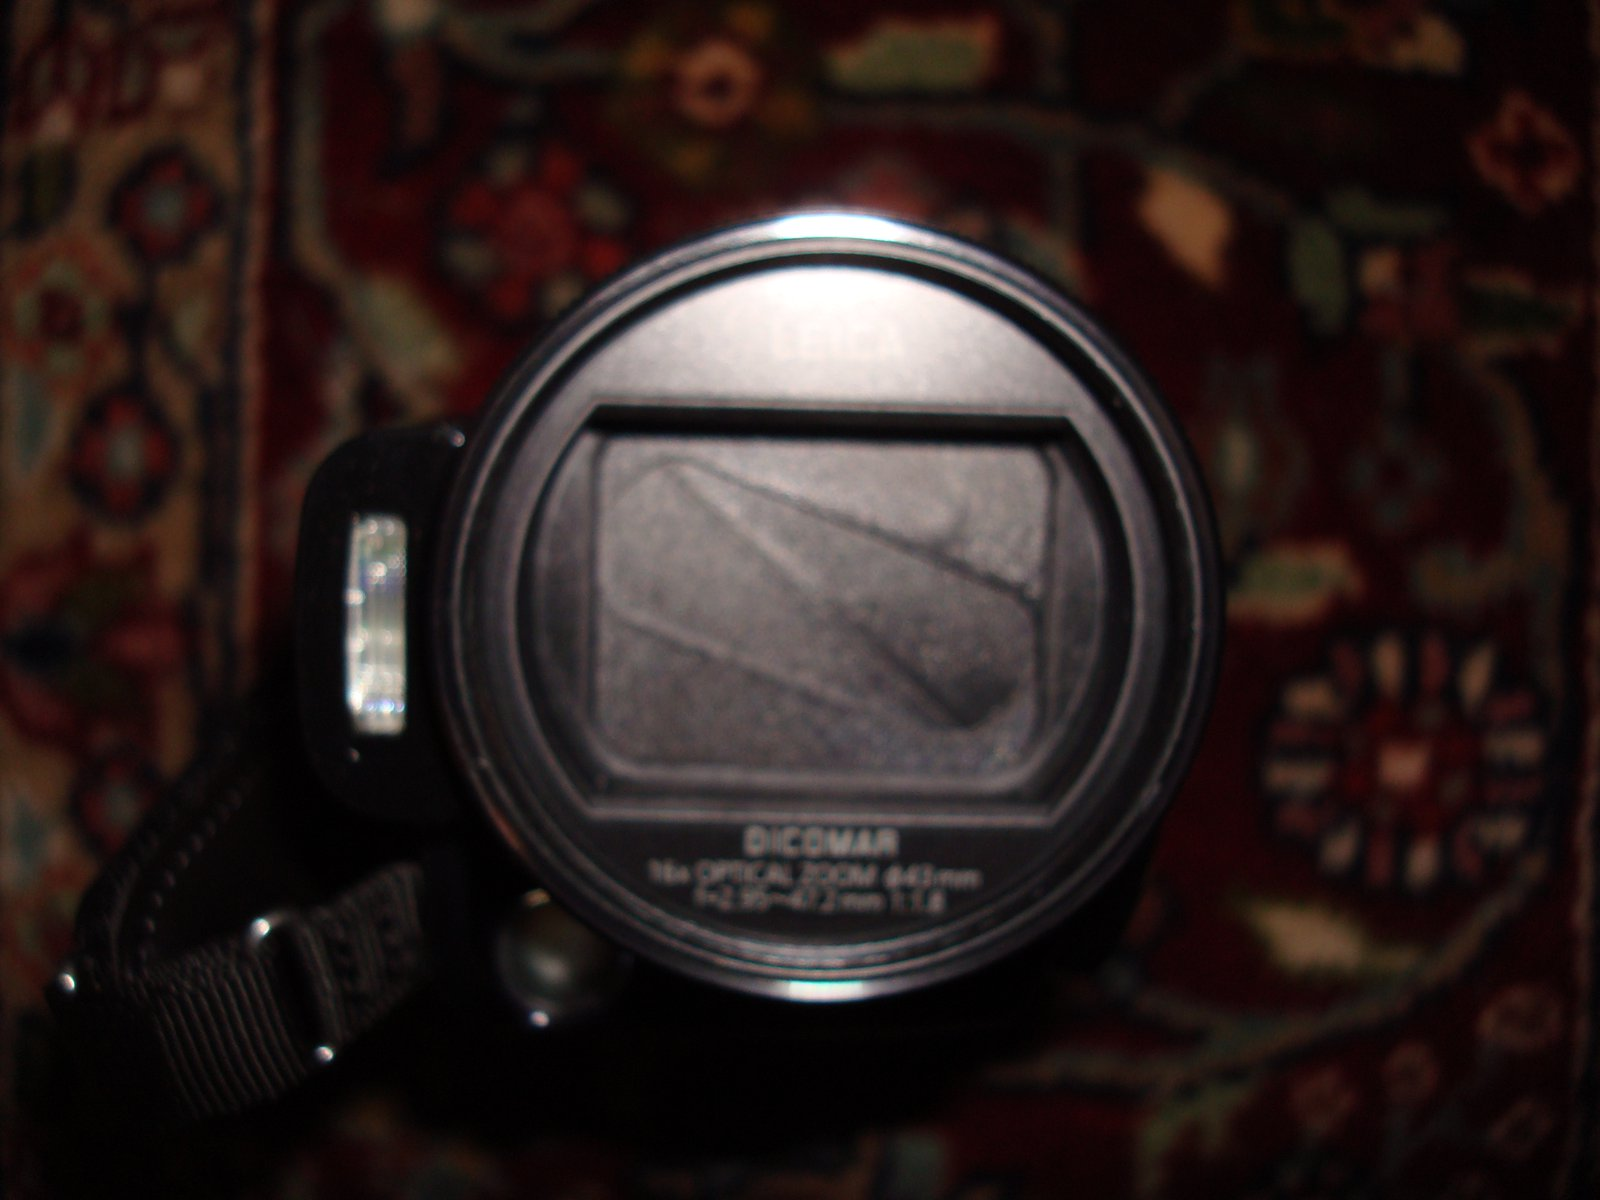 New cam, hdc-tm20 - 2 of 4